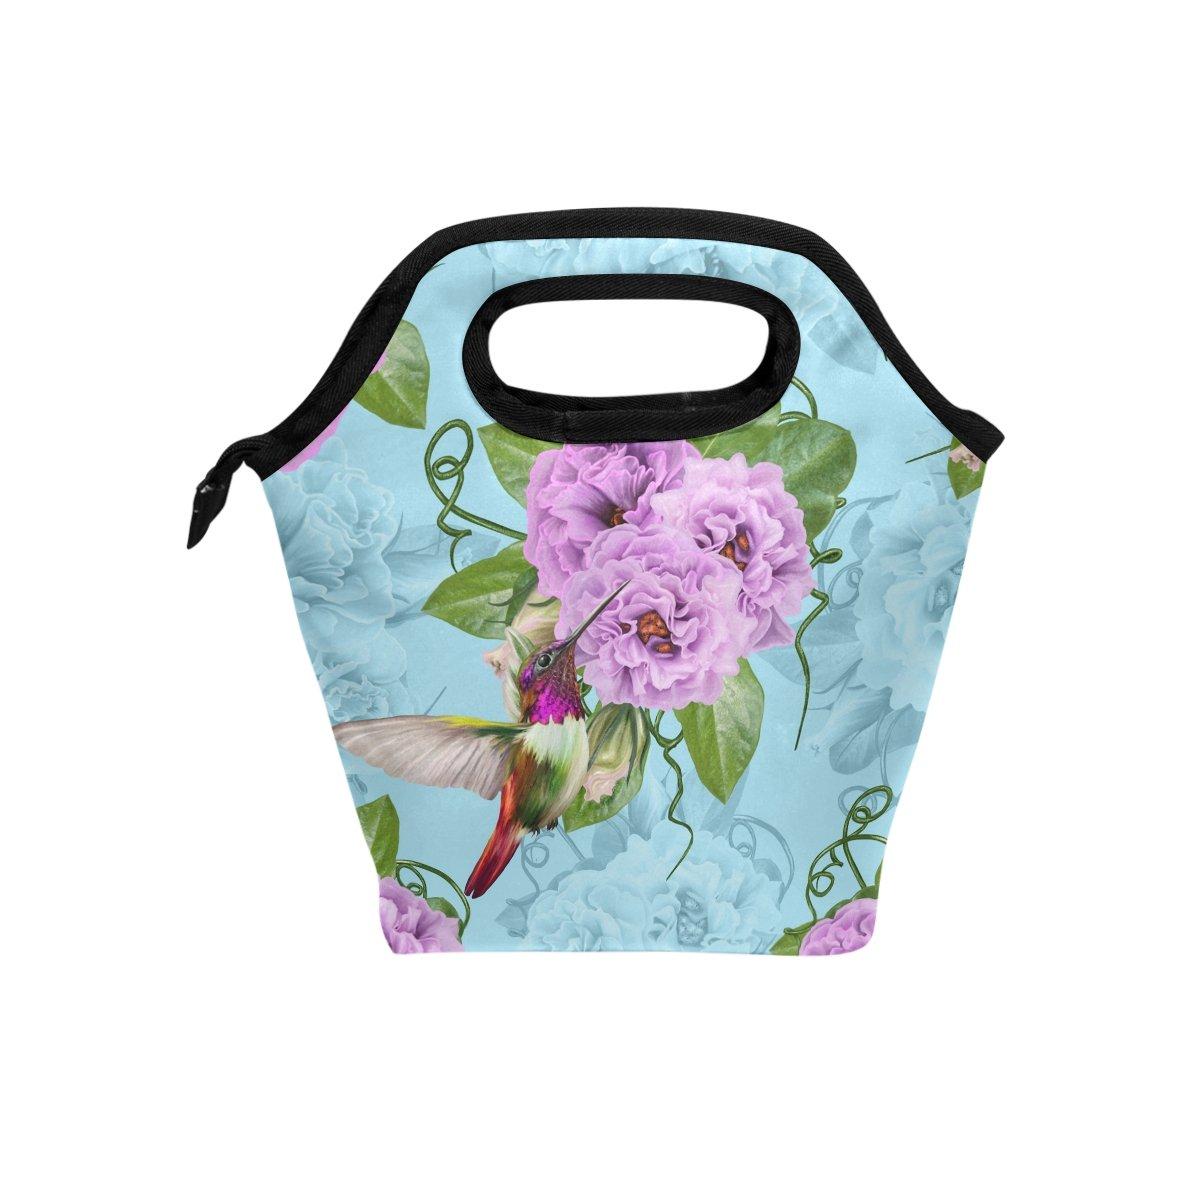 d7a58311efaa Amazon.com: Naanle Floral Hummingbird Insulated Zipper Lunch Bag ...